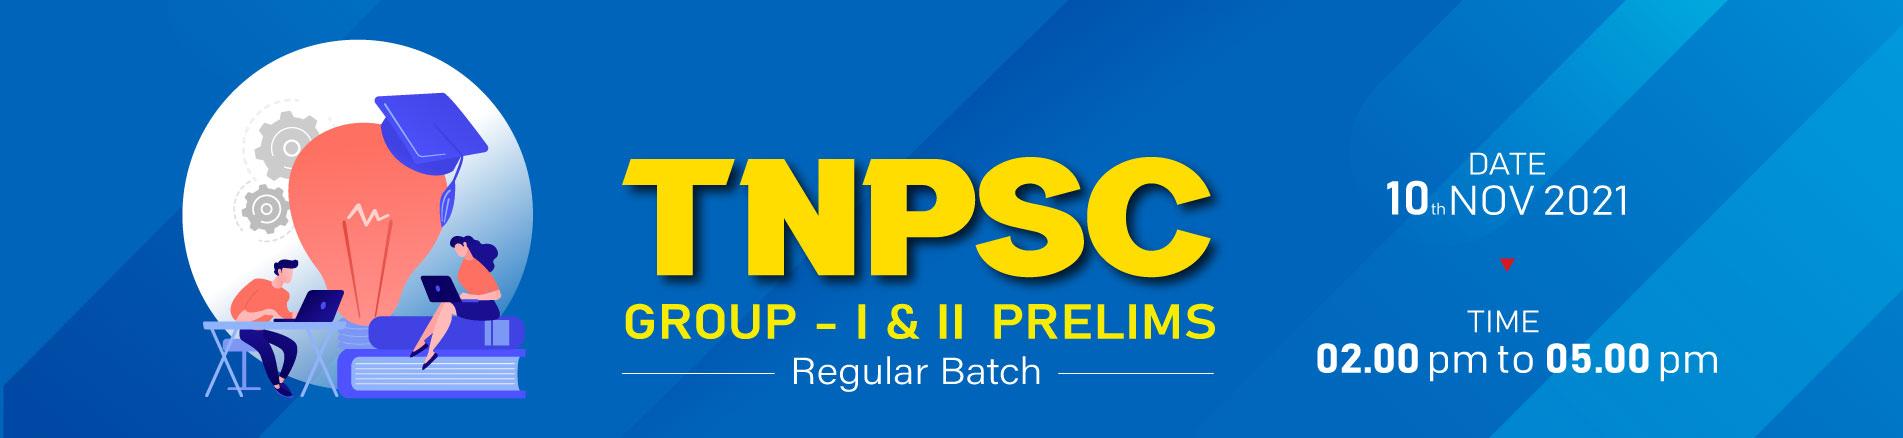 TNPSC Admission